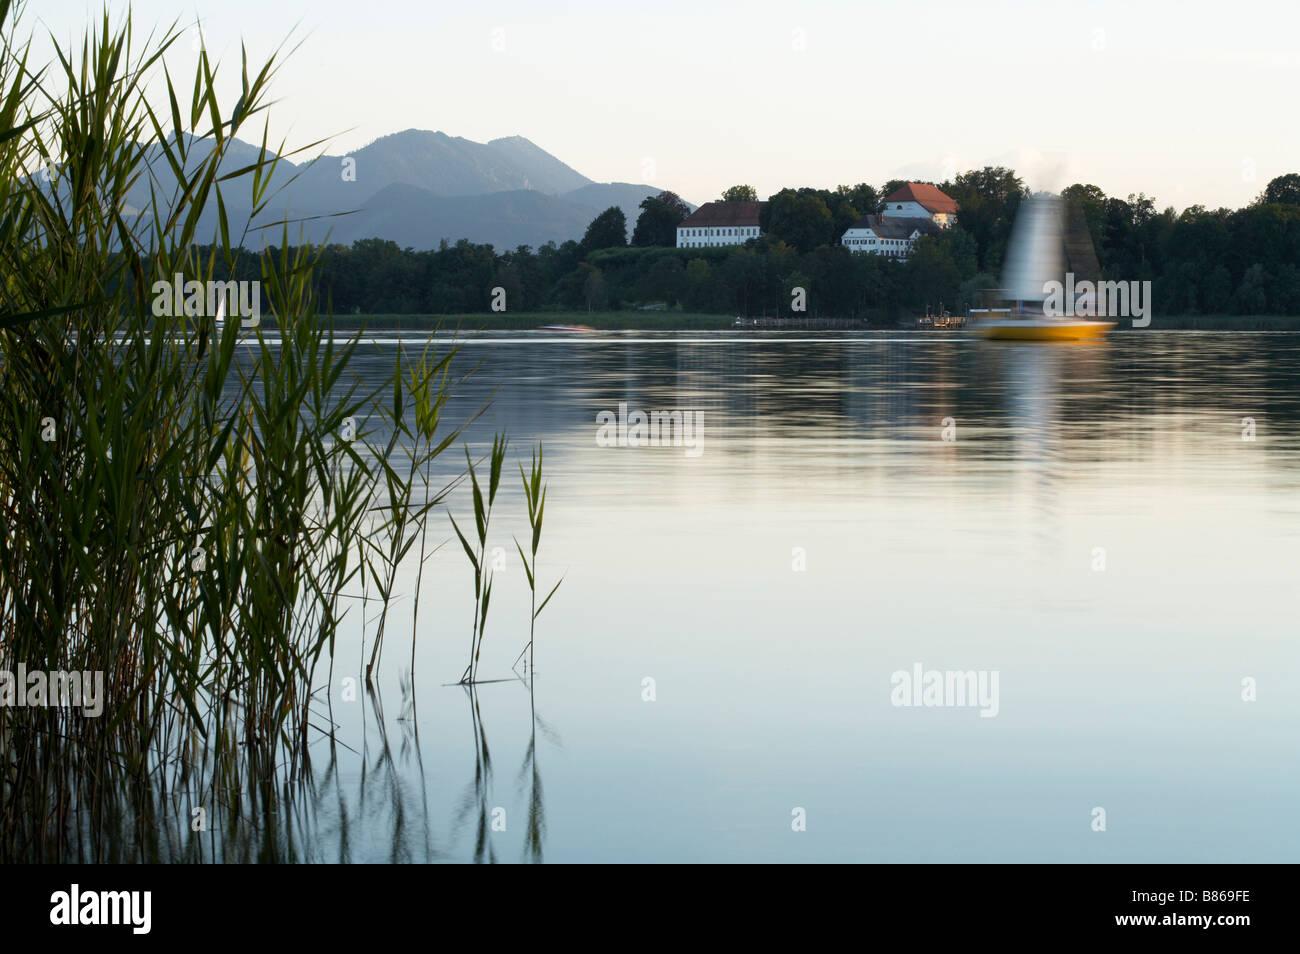 View of the Herren house on the island of Herr Herreninsel Lake chiem Chiemsee Upper Bavaria Gemany Europe 02 08 - Stock Image